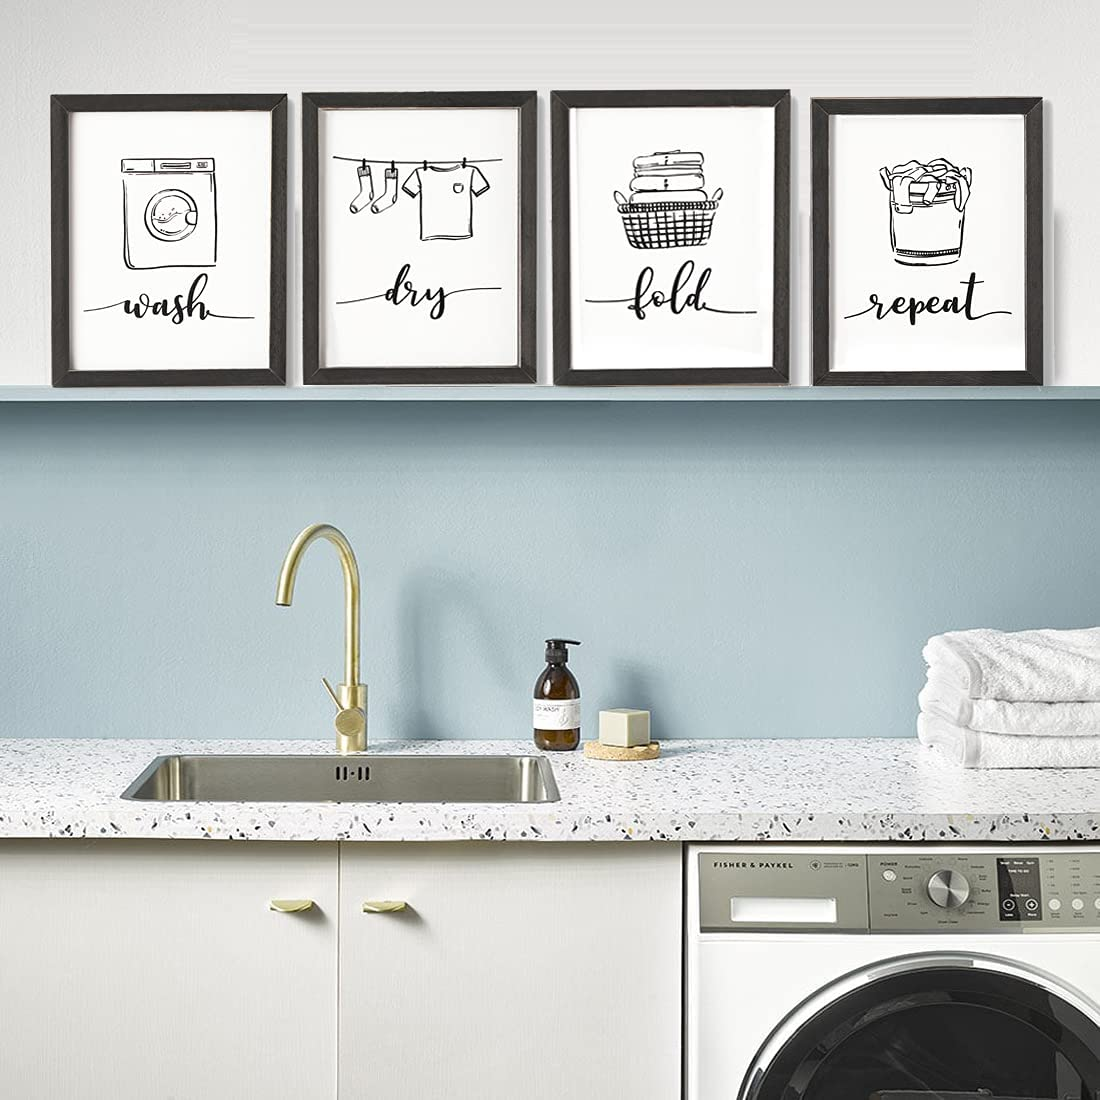 Mokof Laundry Room Decor Wash Fold Dry Repeat Mini Signs Set of 20,  Farmhouse Laundry Room Decorative Sign Framed wood Wall Art, Laundry Shelf  Decor, ...